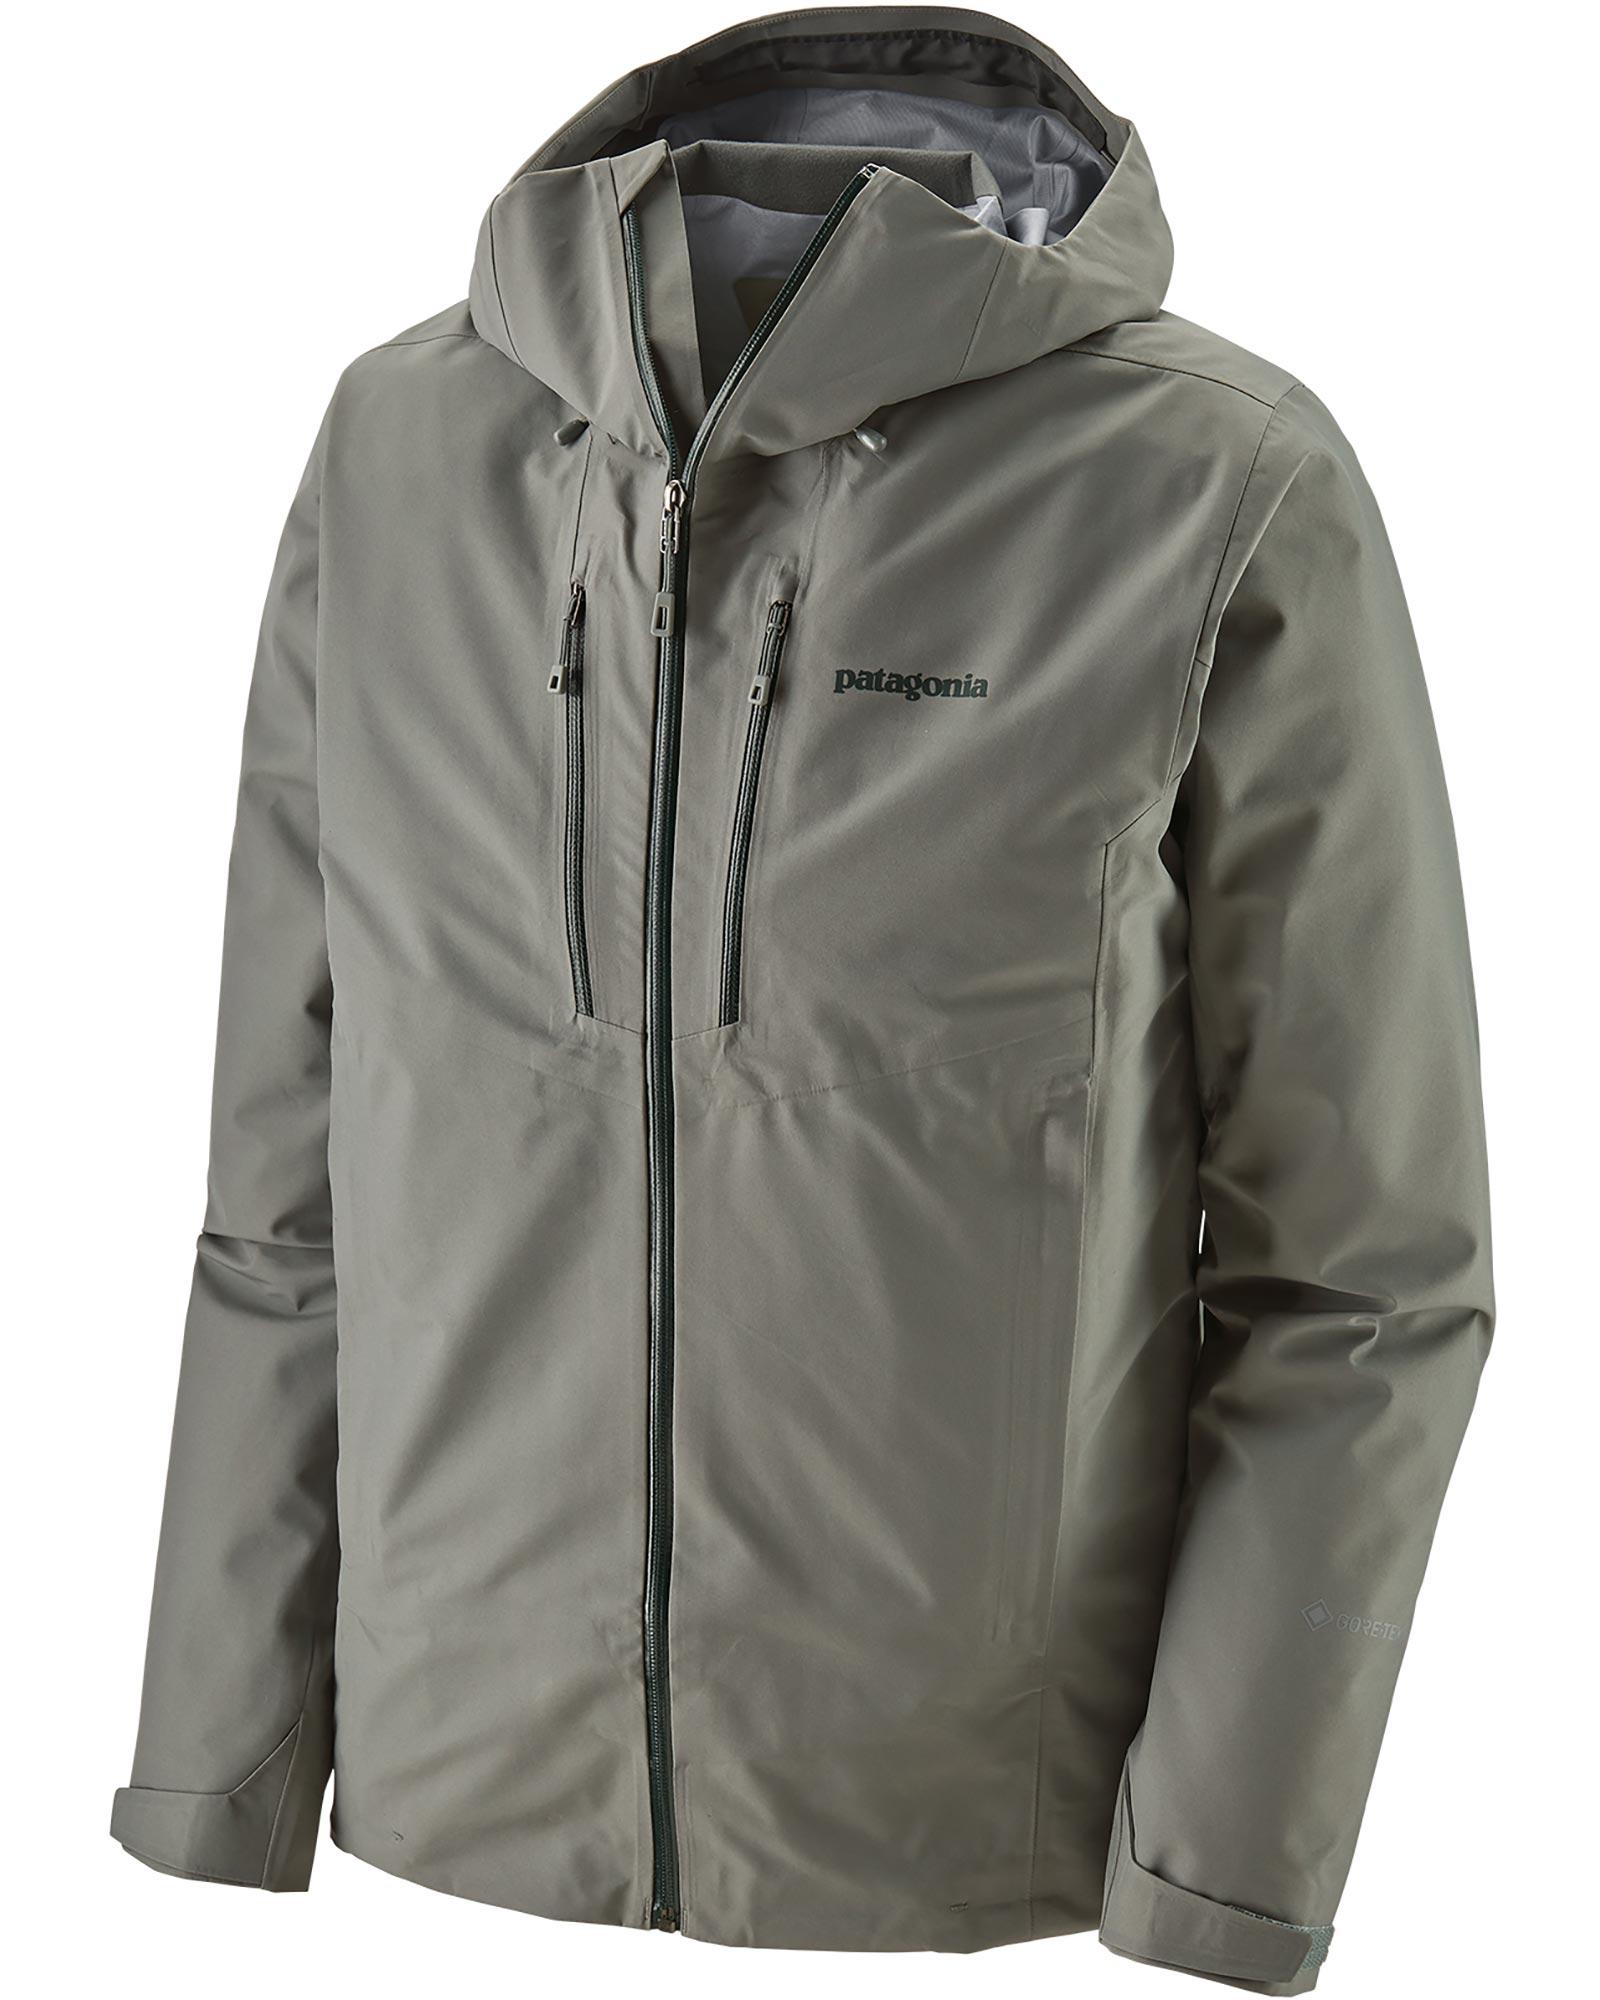 Patagonia Men's Triolet GORE-TEX Jacket 0